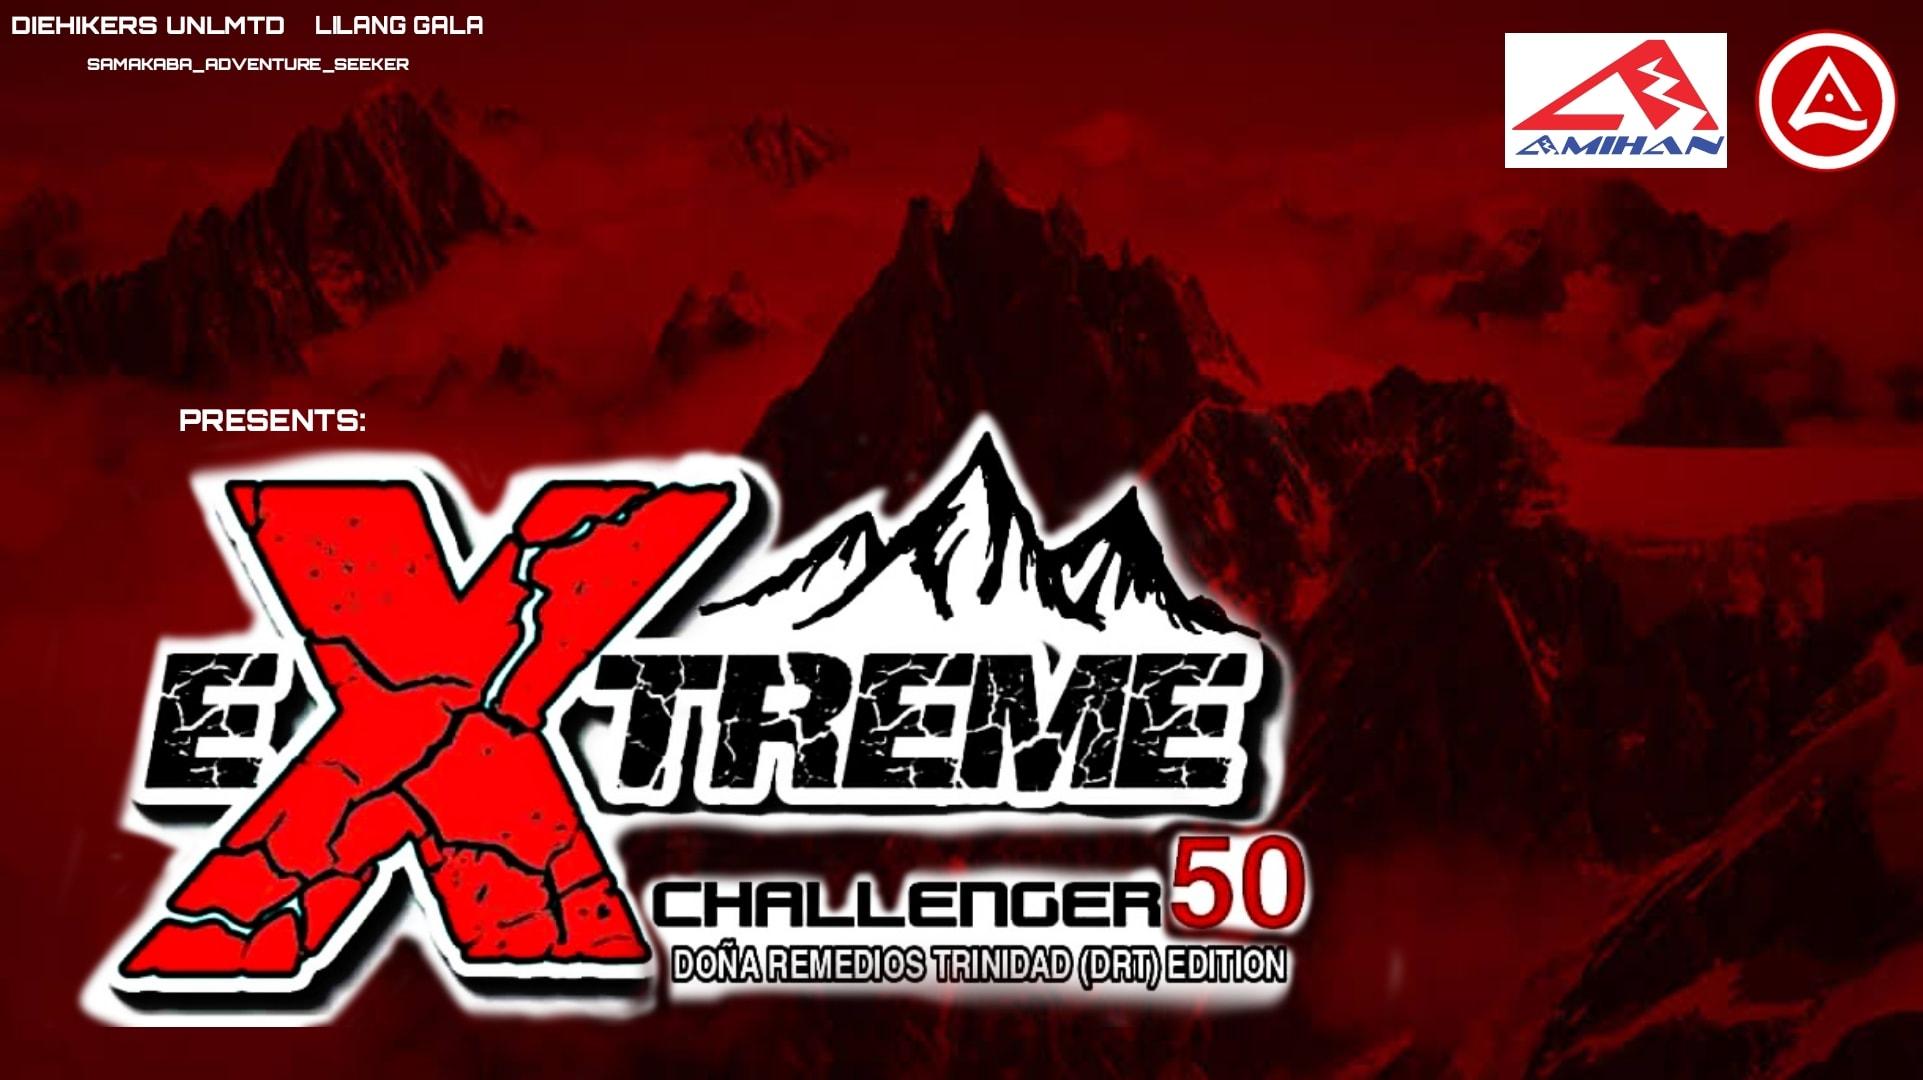 ExtremeChallenger'50